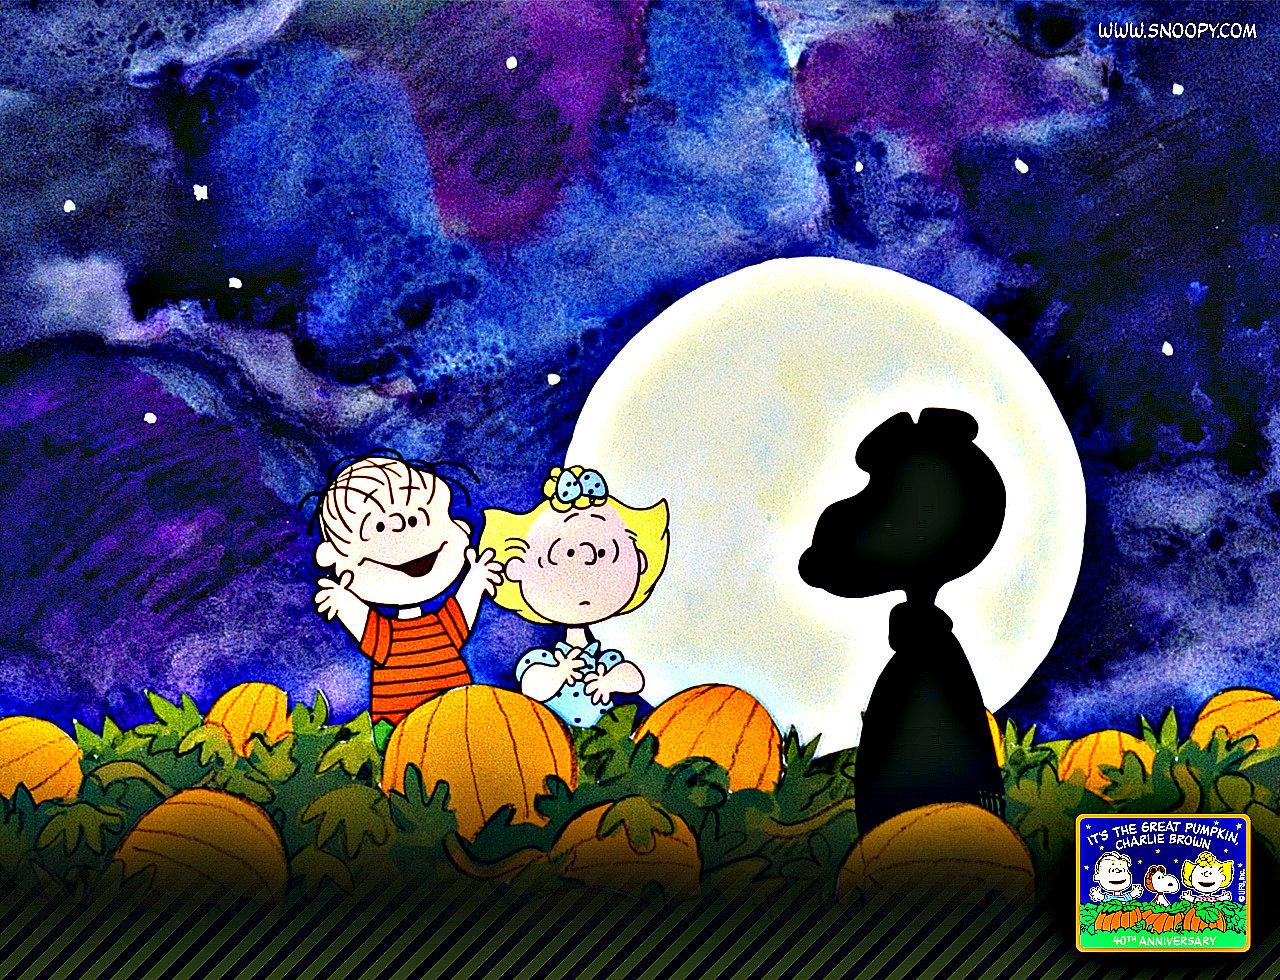 76 Peanuts Halloween Wallpaper On Wallpapersafari